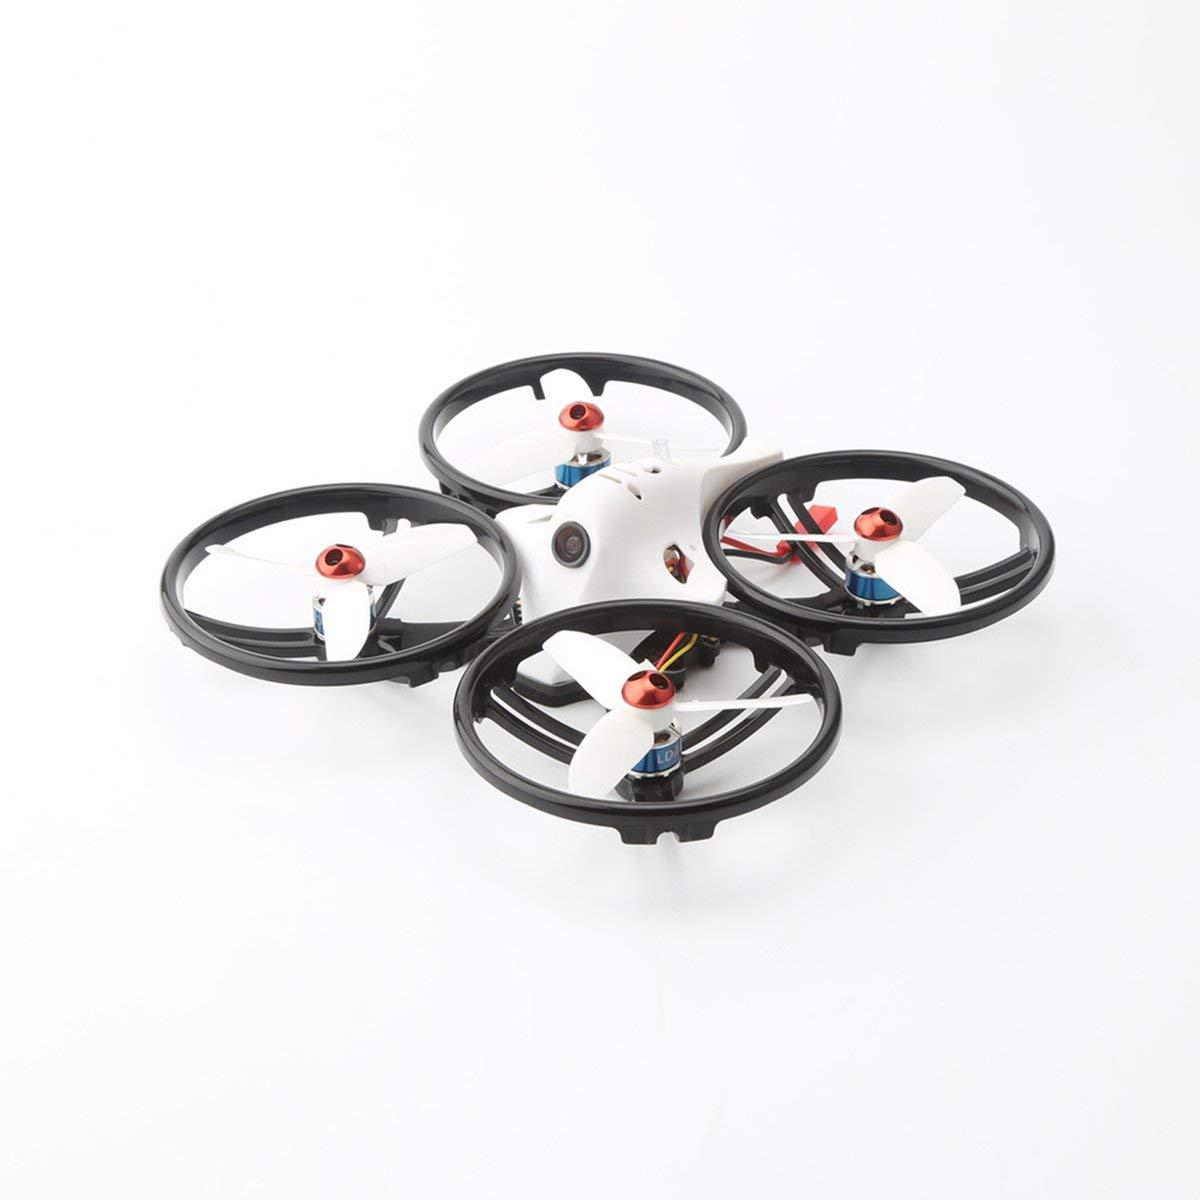 Gugutogo Drohne mit Kamera LDARC ET125 V2 5.8G Brushless OSD RX2A PRO RX-Kamera Mini FPV RC Racing Drohne PNP